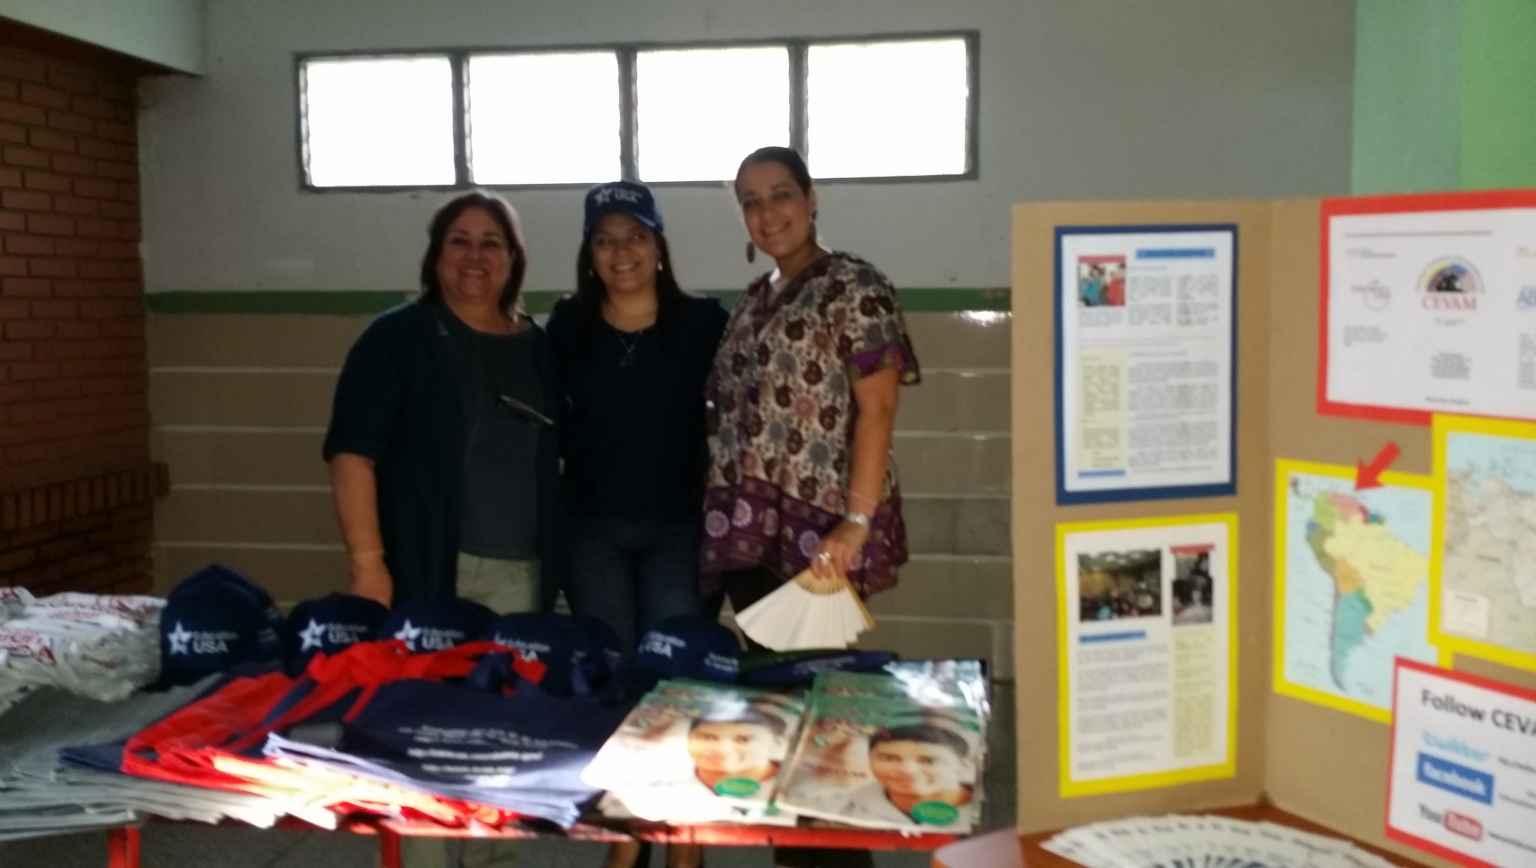 EducationUSA advising center Merida